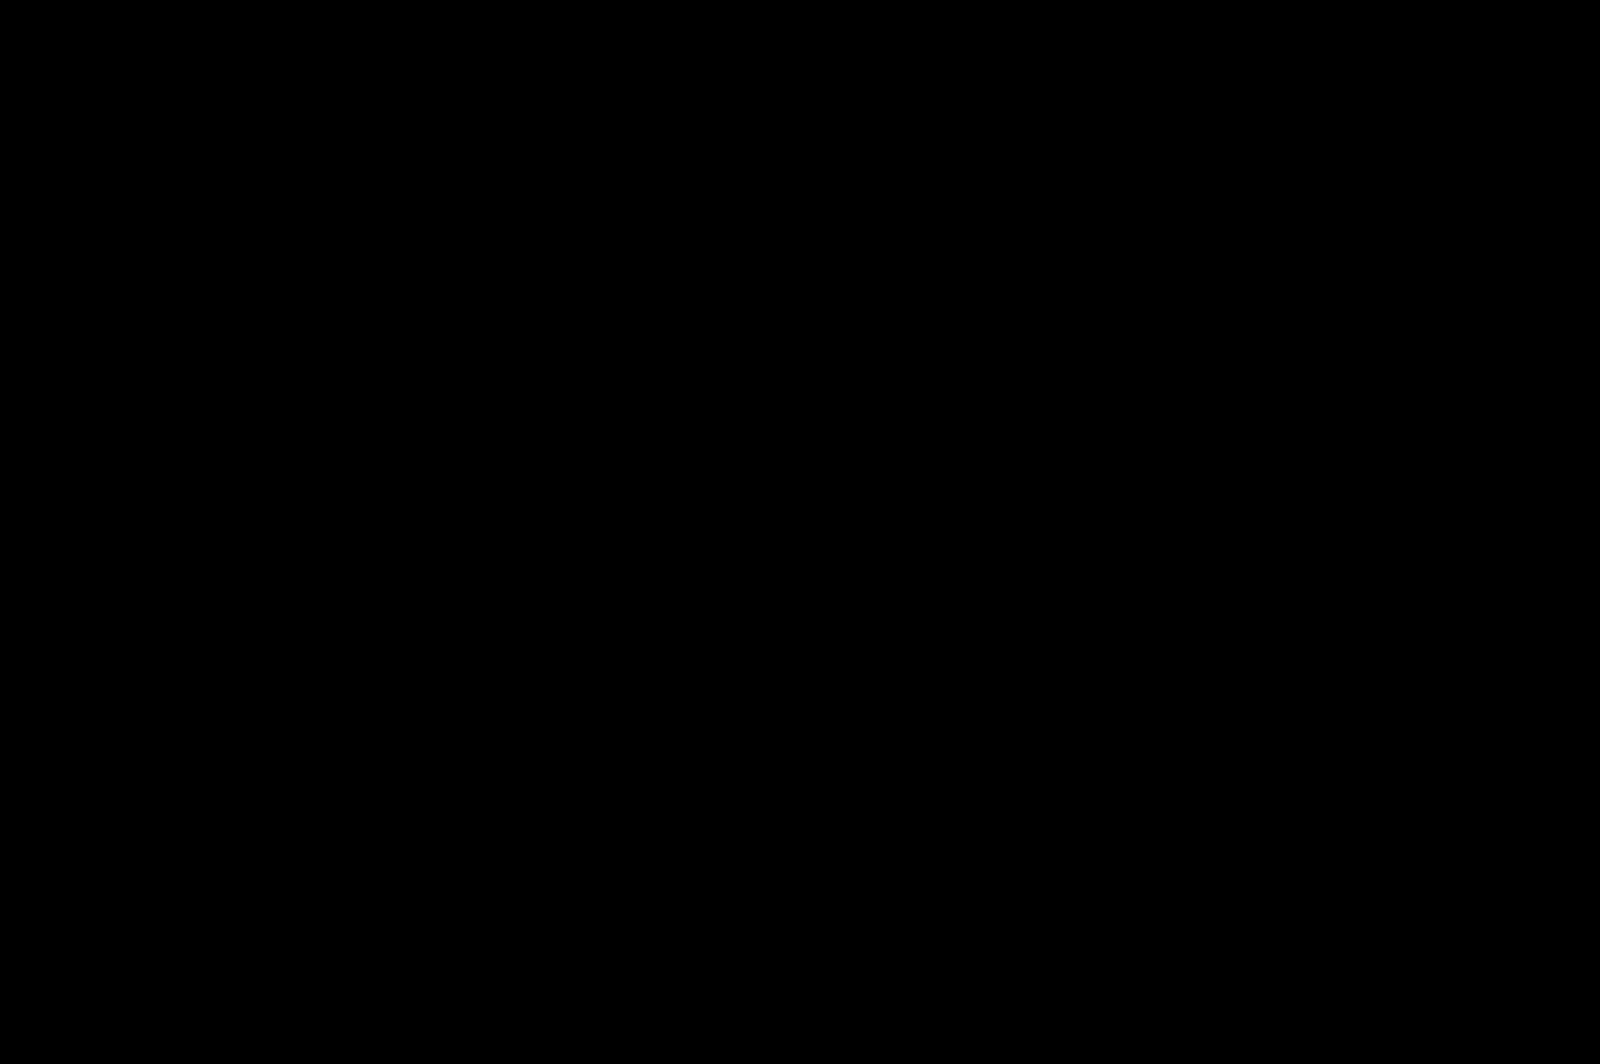 ciguena